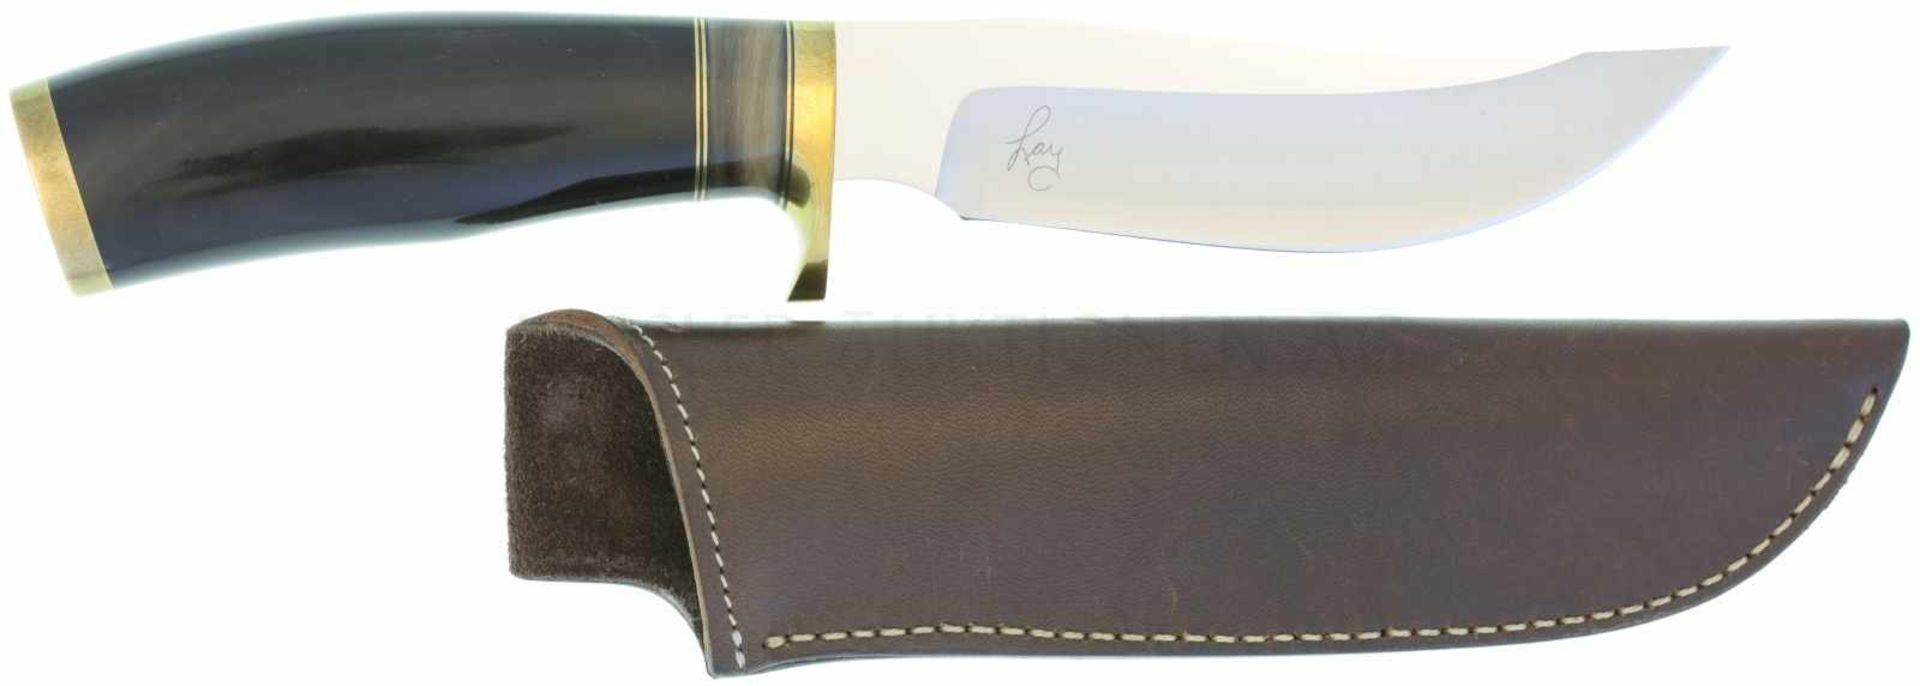 Traditional Skinner Bob Lay KL 133mm, TL 250mm, polierte geschweifte Rückenklinge, linksseitig